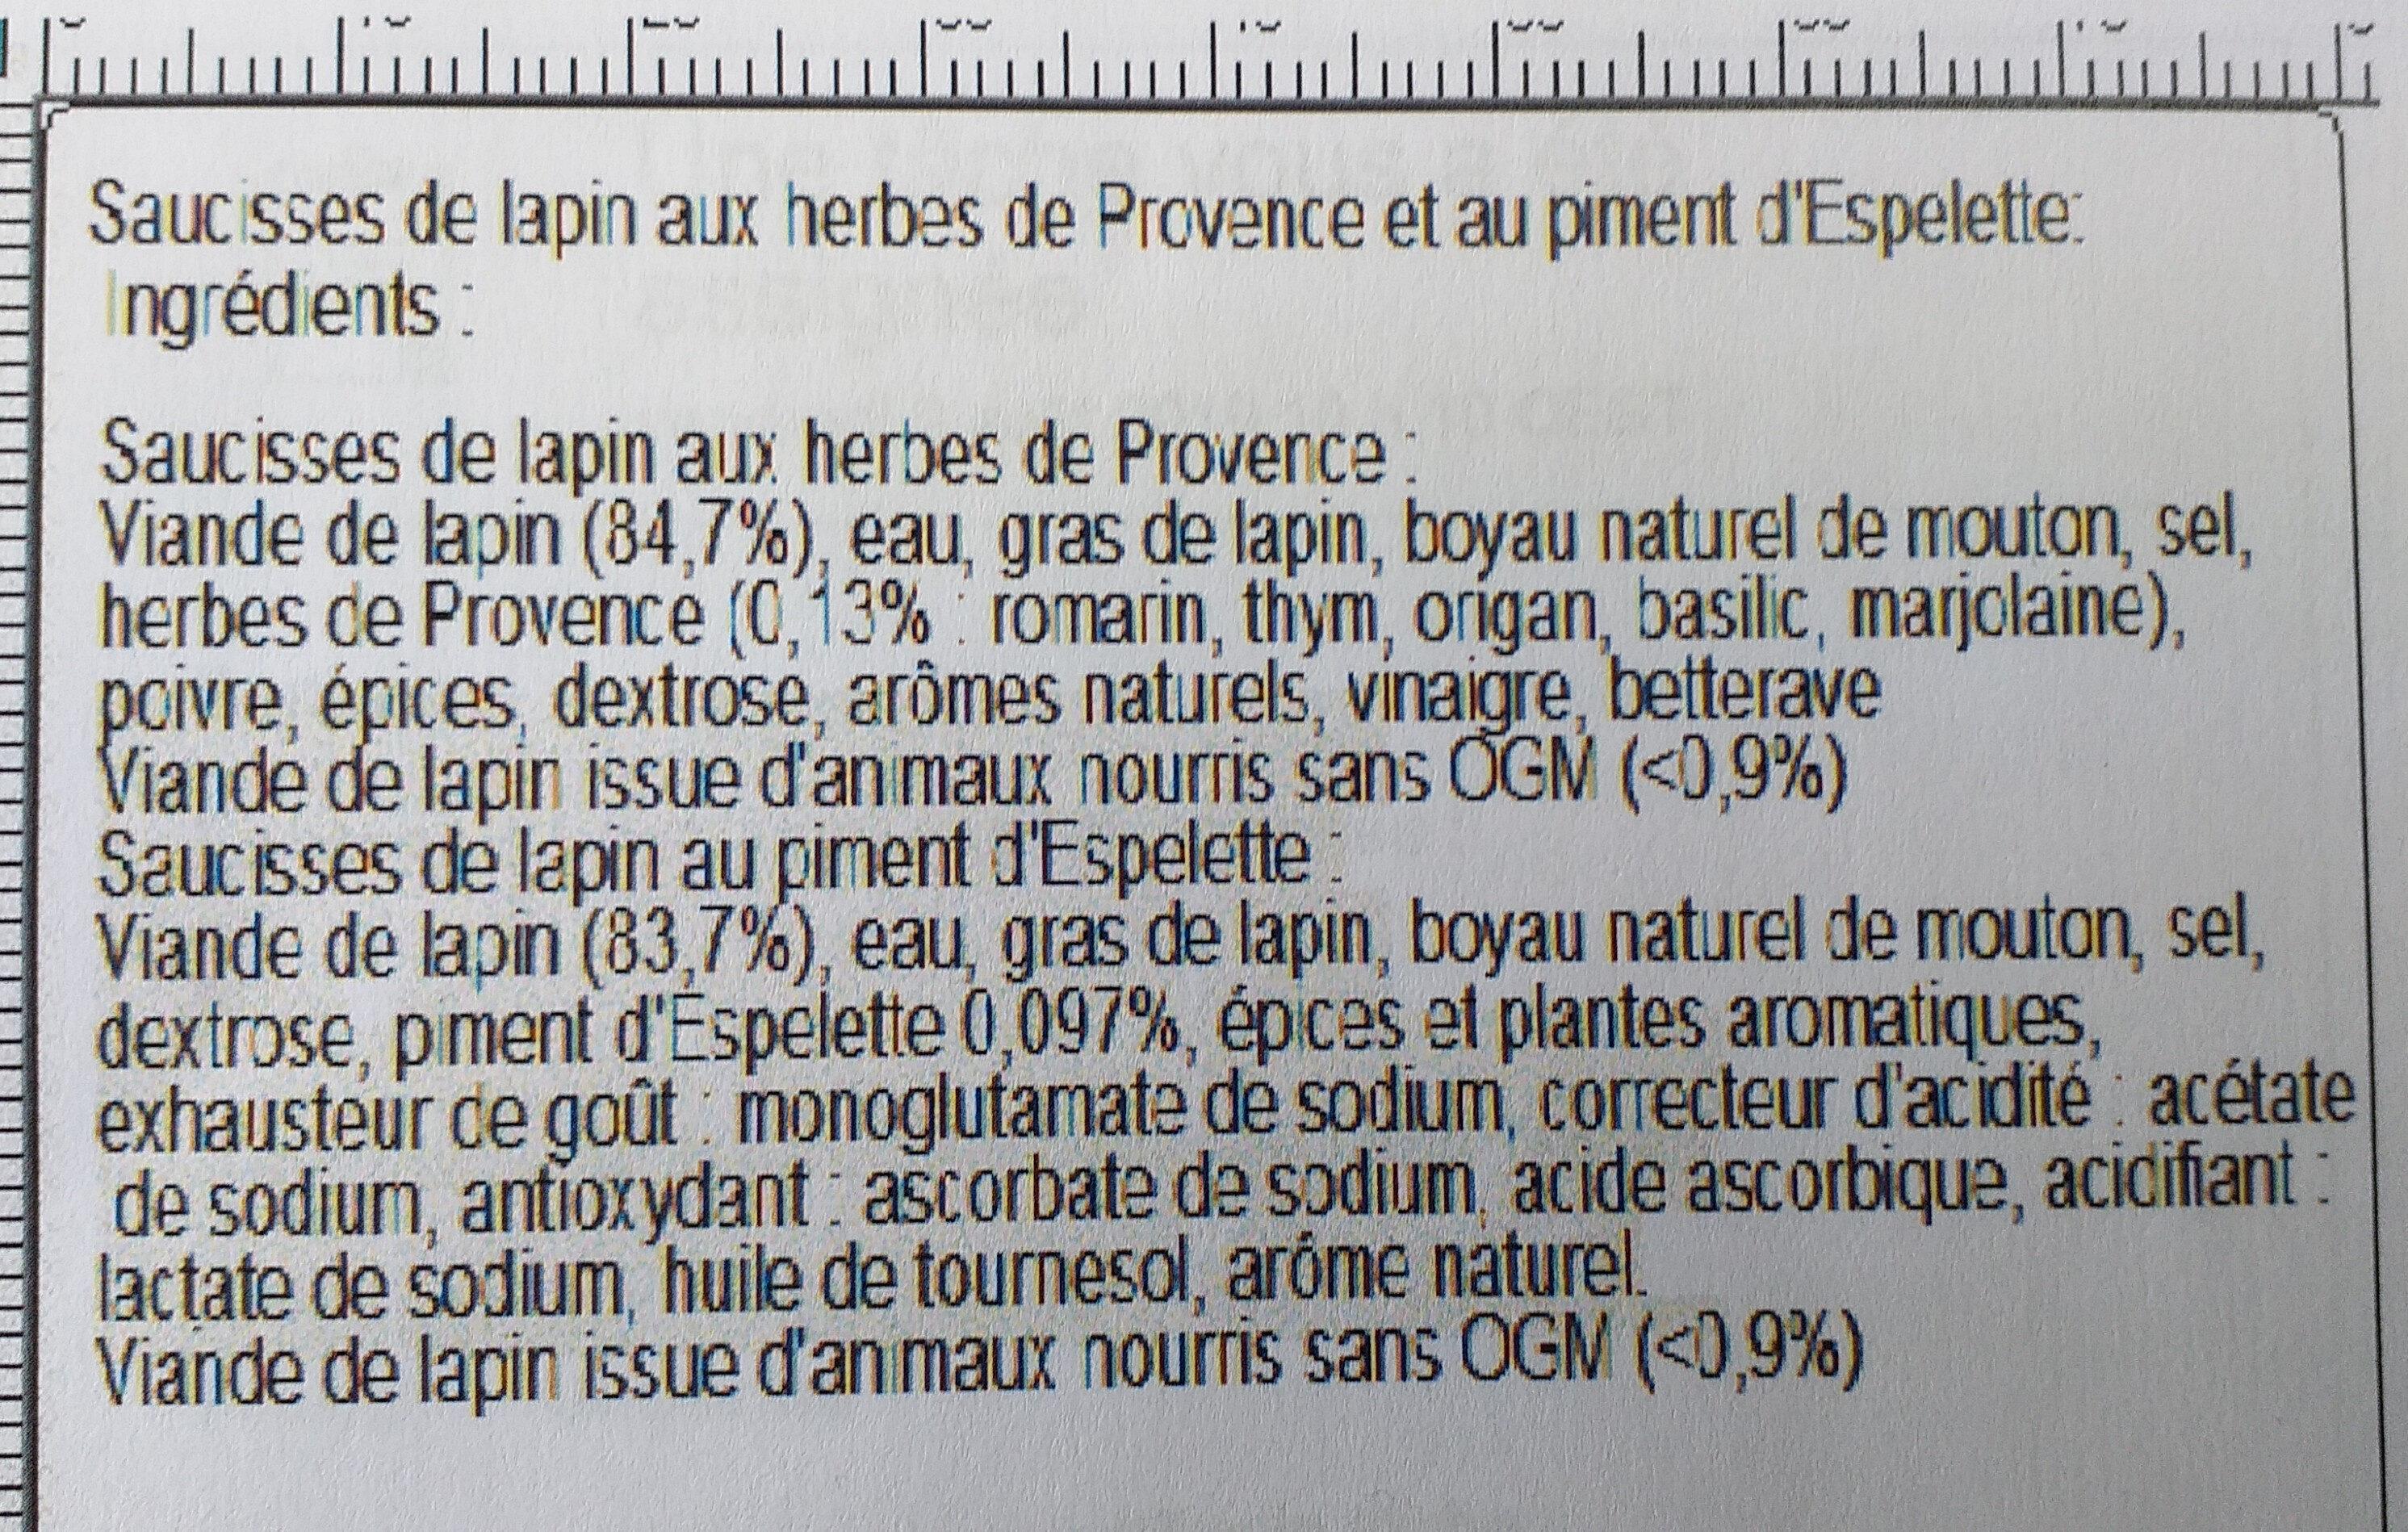 MINI-SAUCISSES LAPIN: Herbes Provence + piment d'Espellette - Ingrediënten - fr